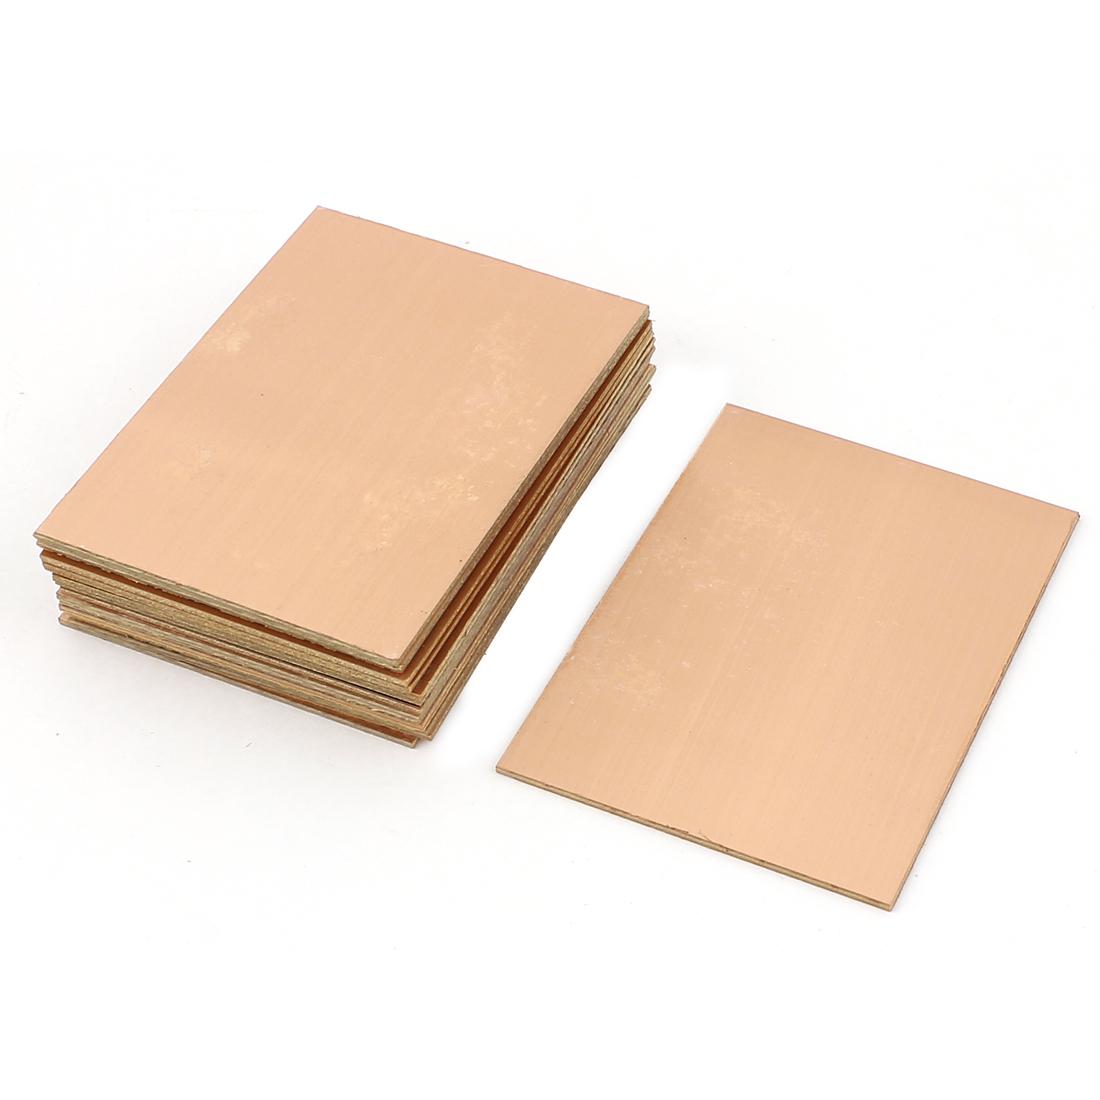 15Pcs 70 x 100 x 1.5mm FR-4 Single Side Copper Clad PCB Laminate Board